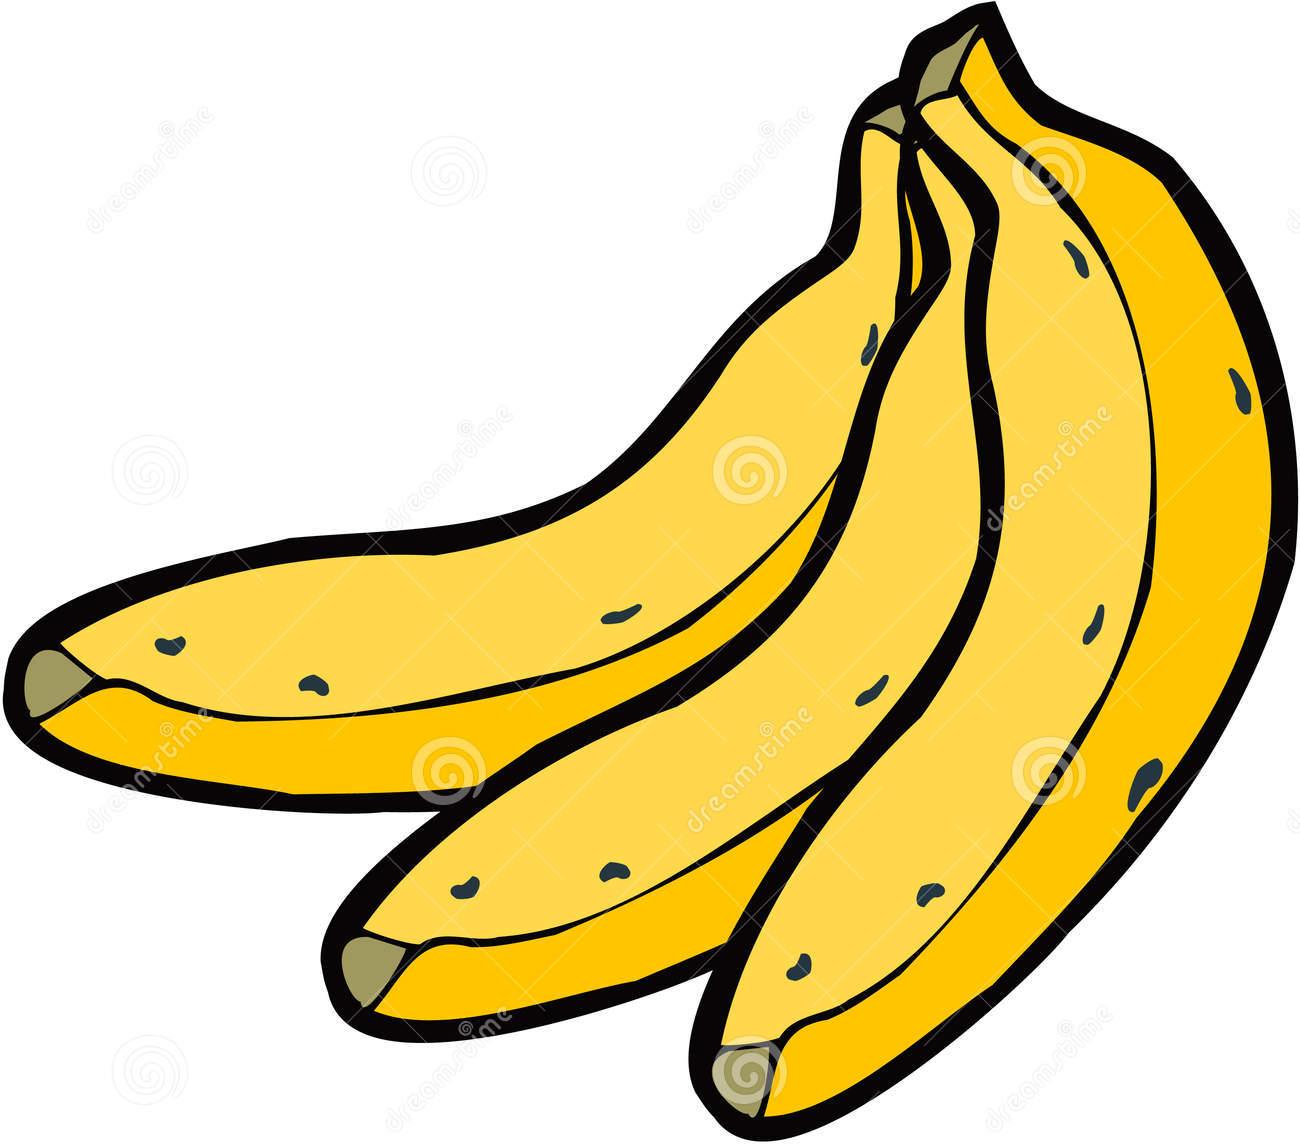 Banana clipart #12, Download drawings